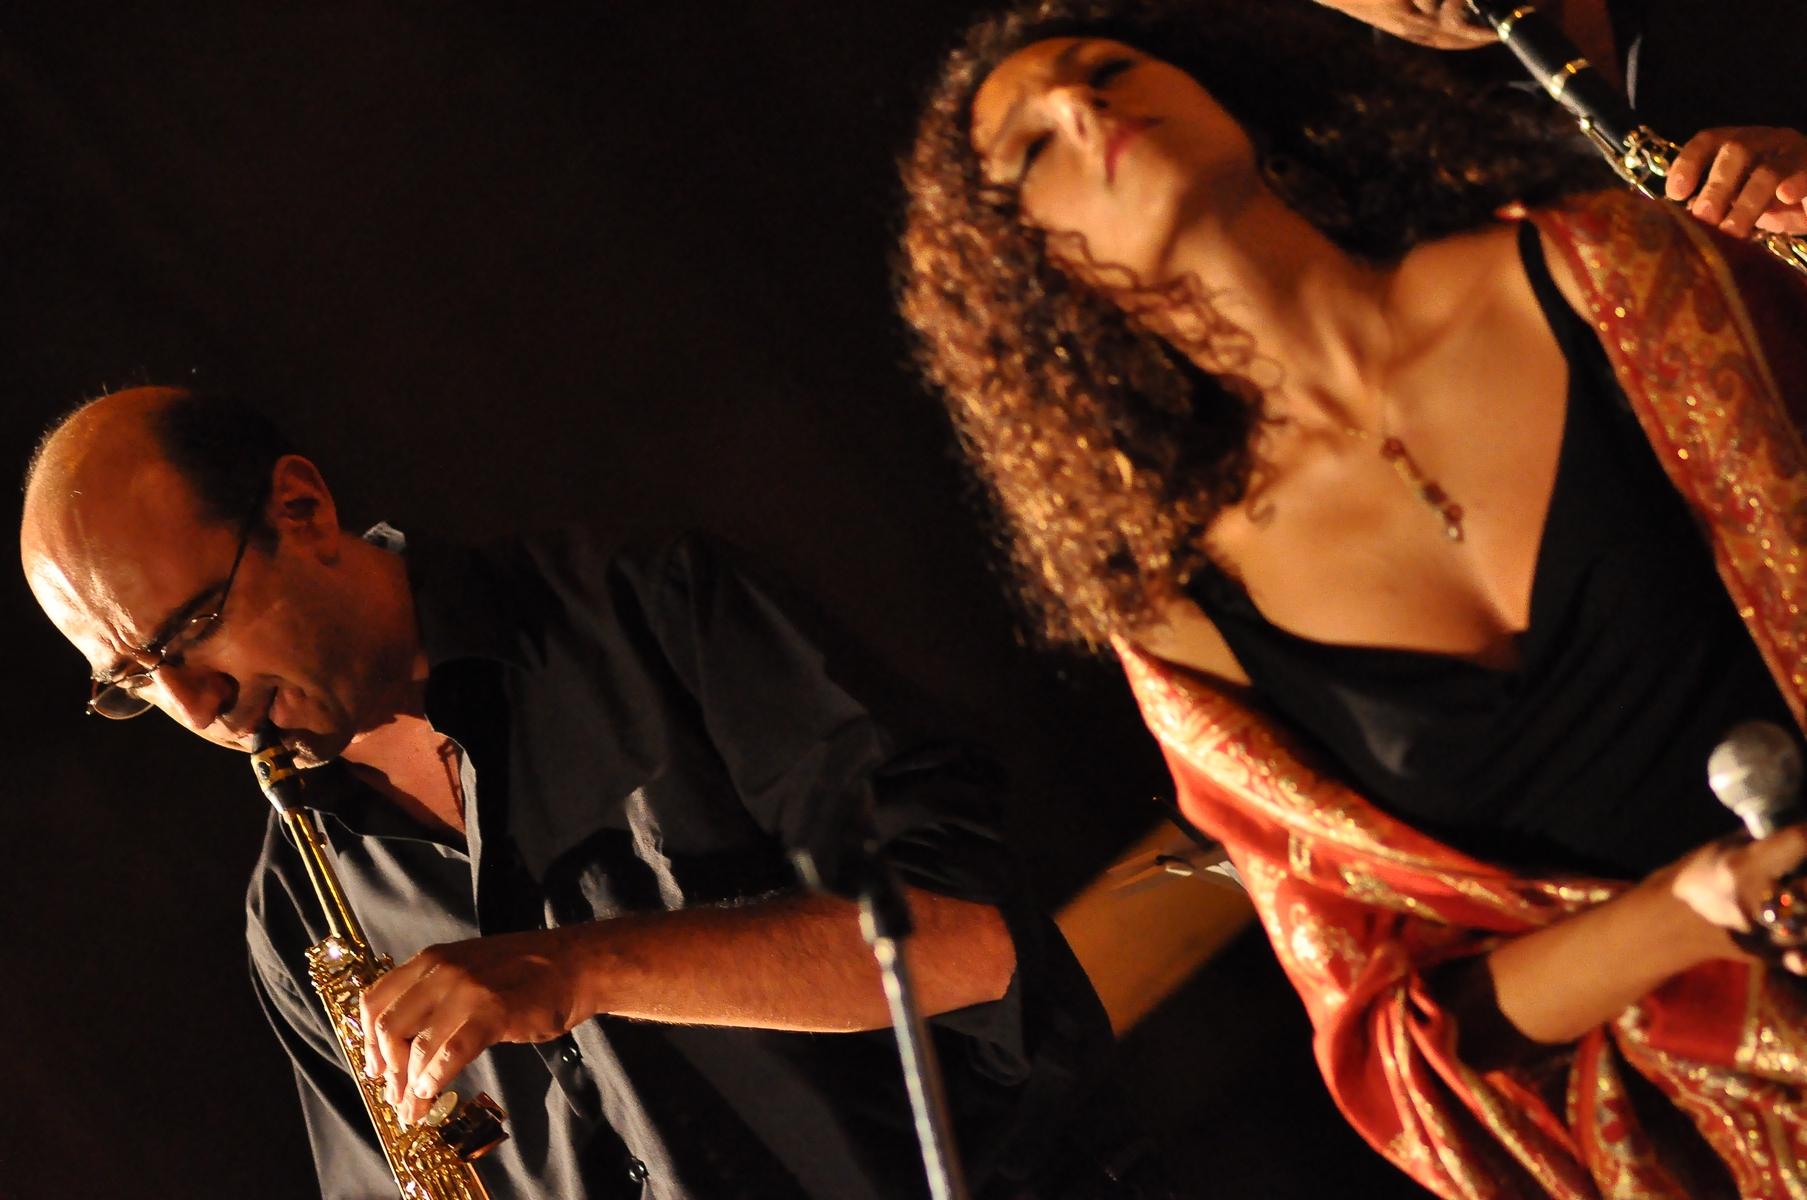 Sùn Ná Summer Tour, Max Fuschetto in concerto a Castelpoto